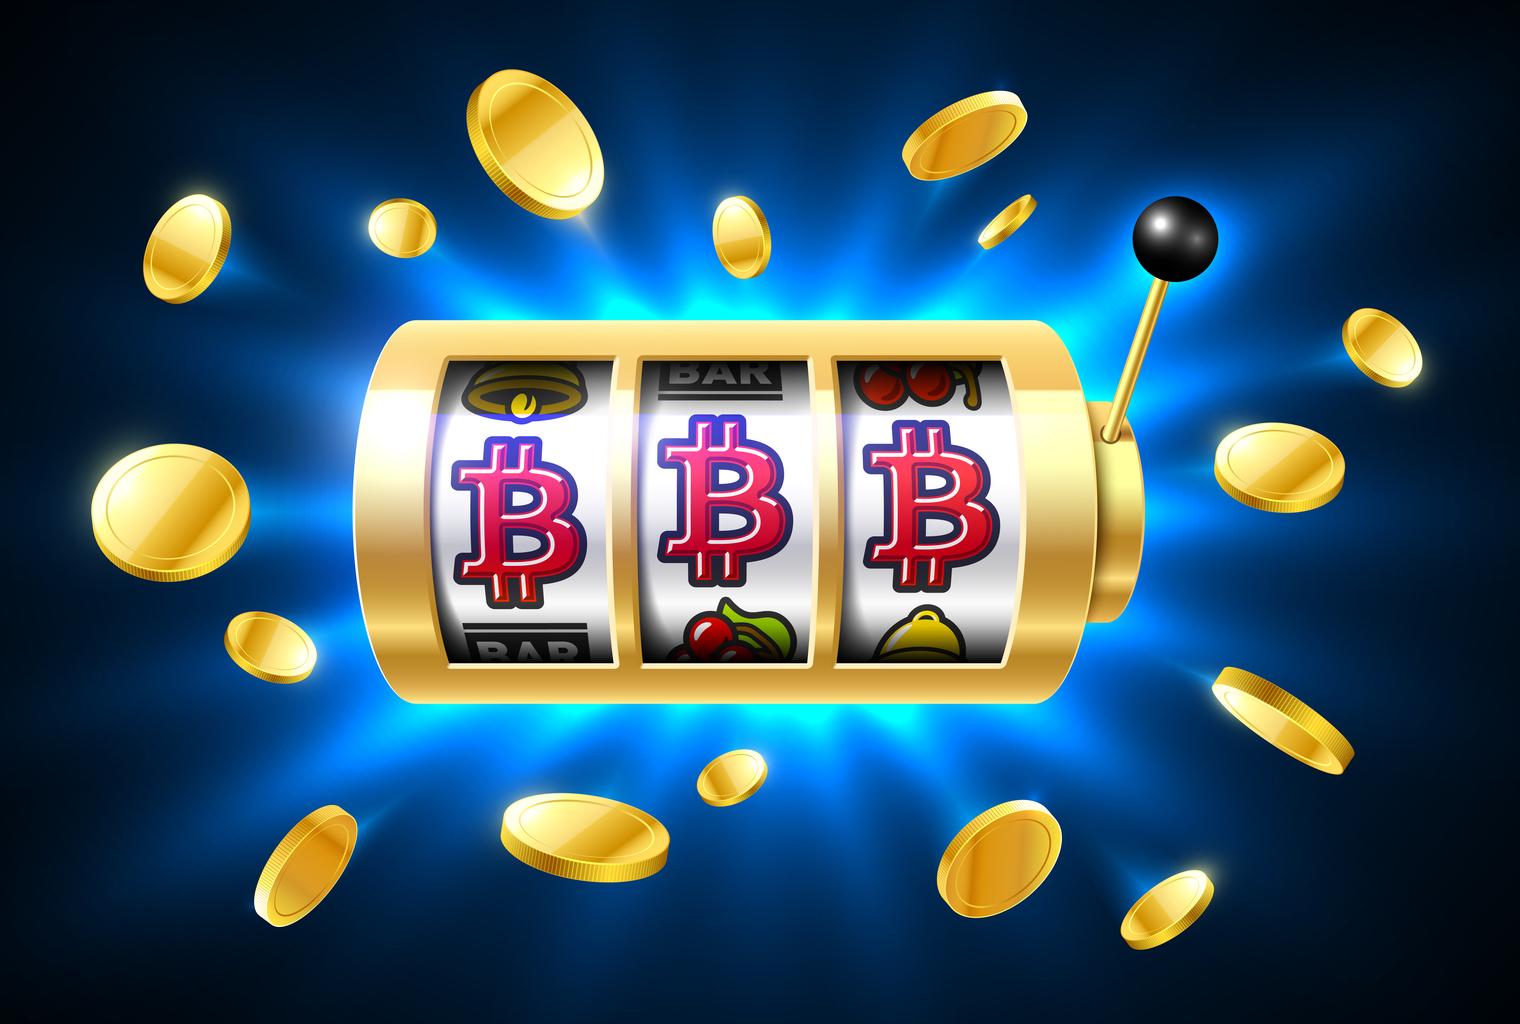 Mesin slot bitcoin terbaik untuk bermain 2020